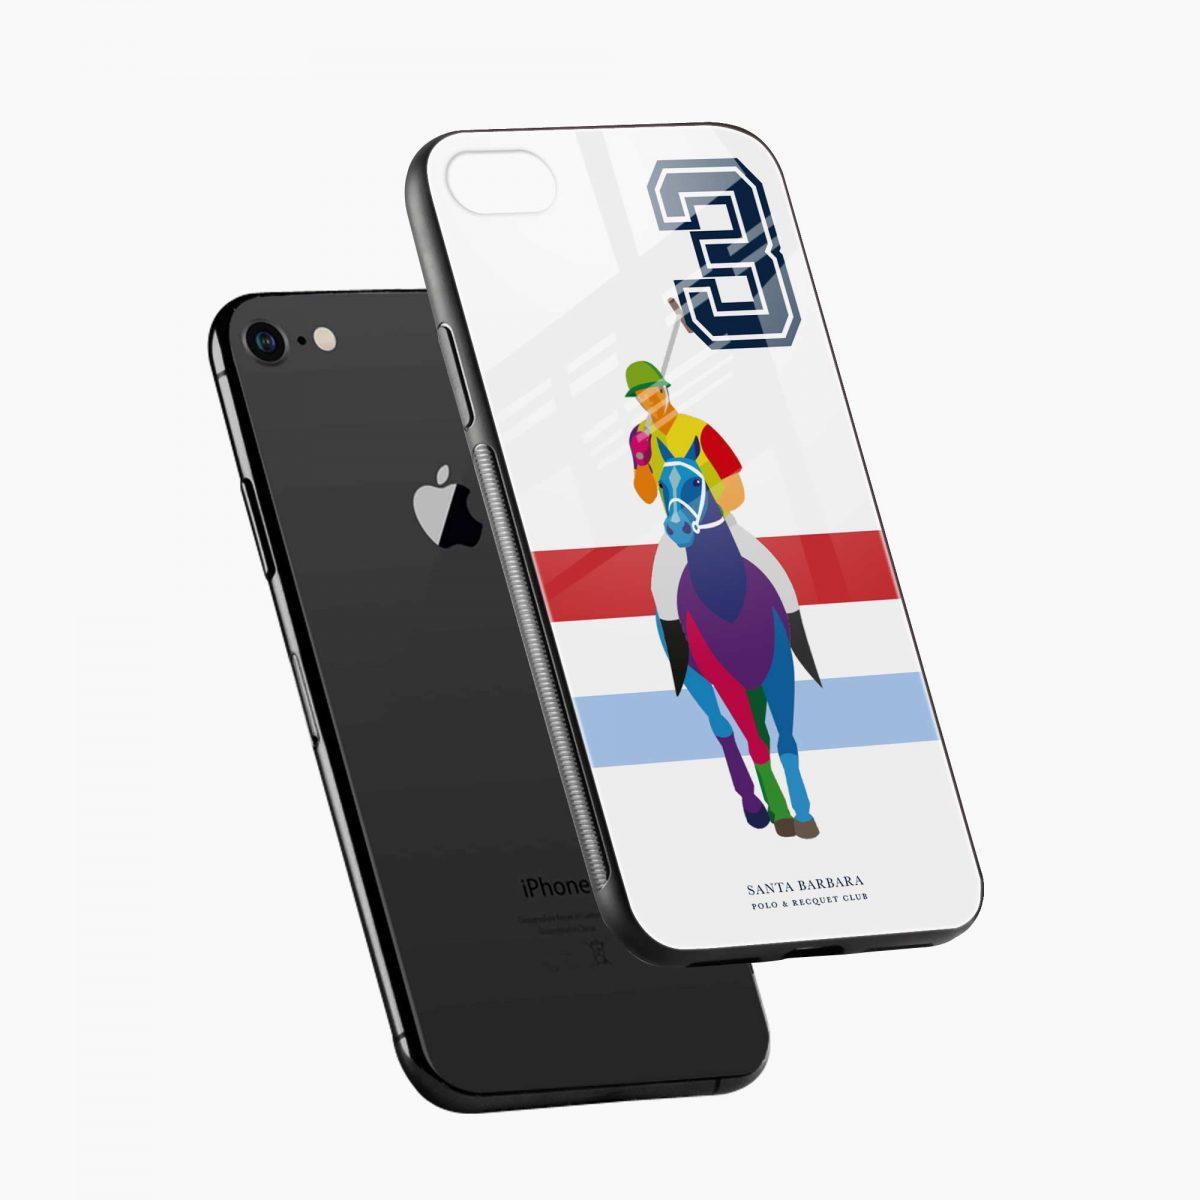 multicolor sant barbara polo diagonal view apple iphone 6 7 8 se back cover